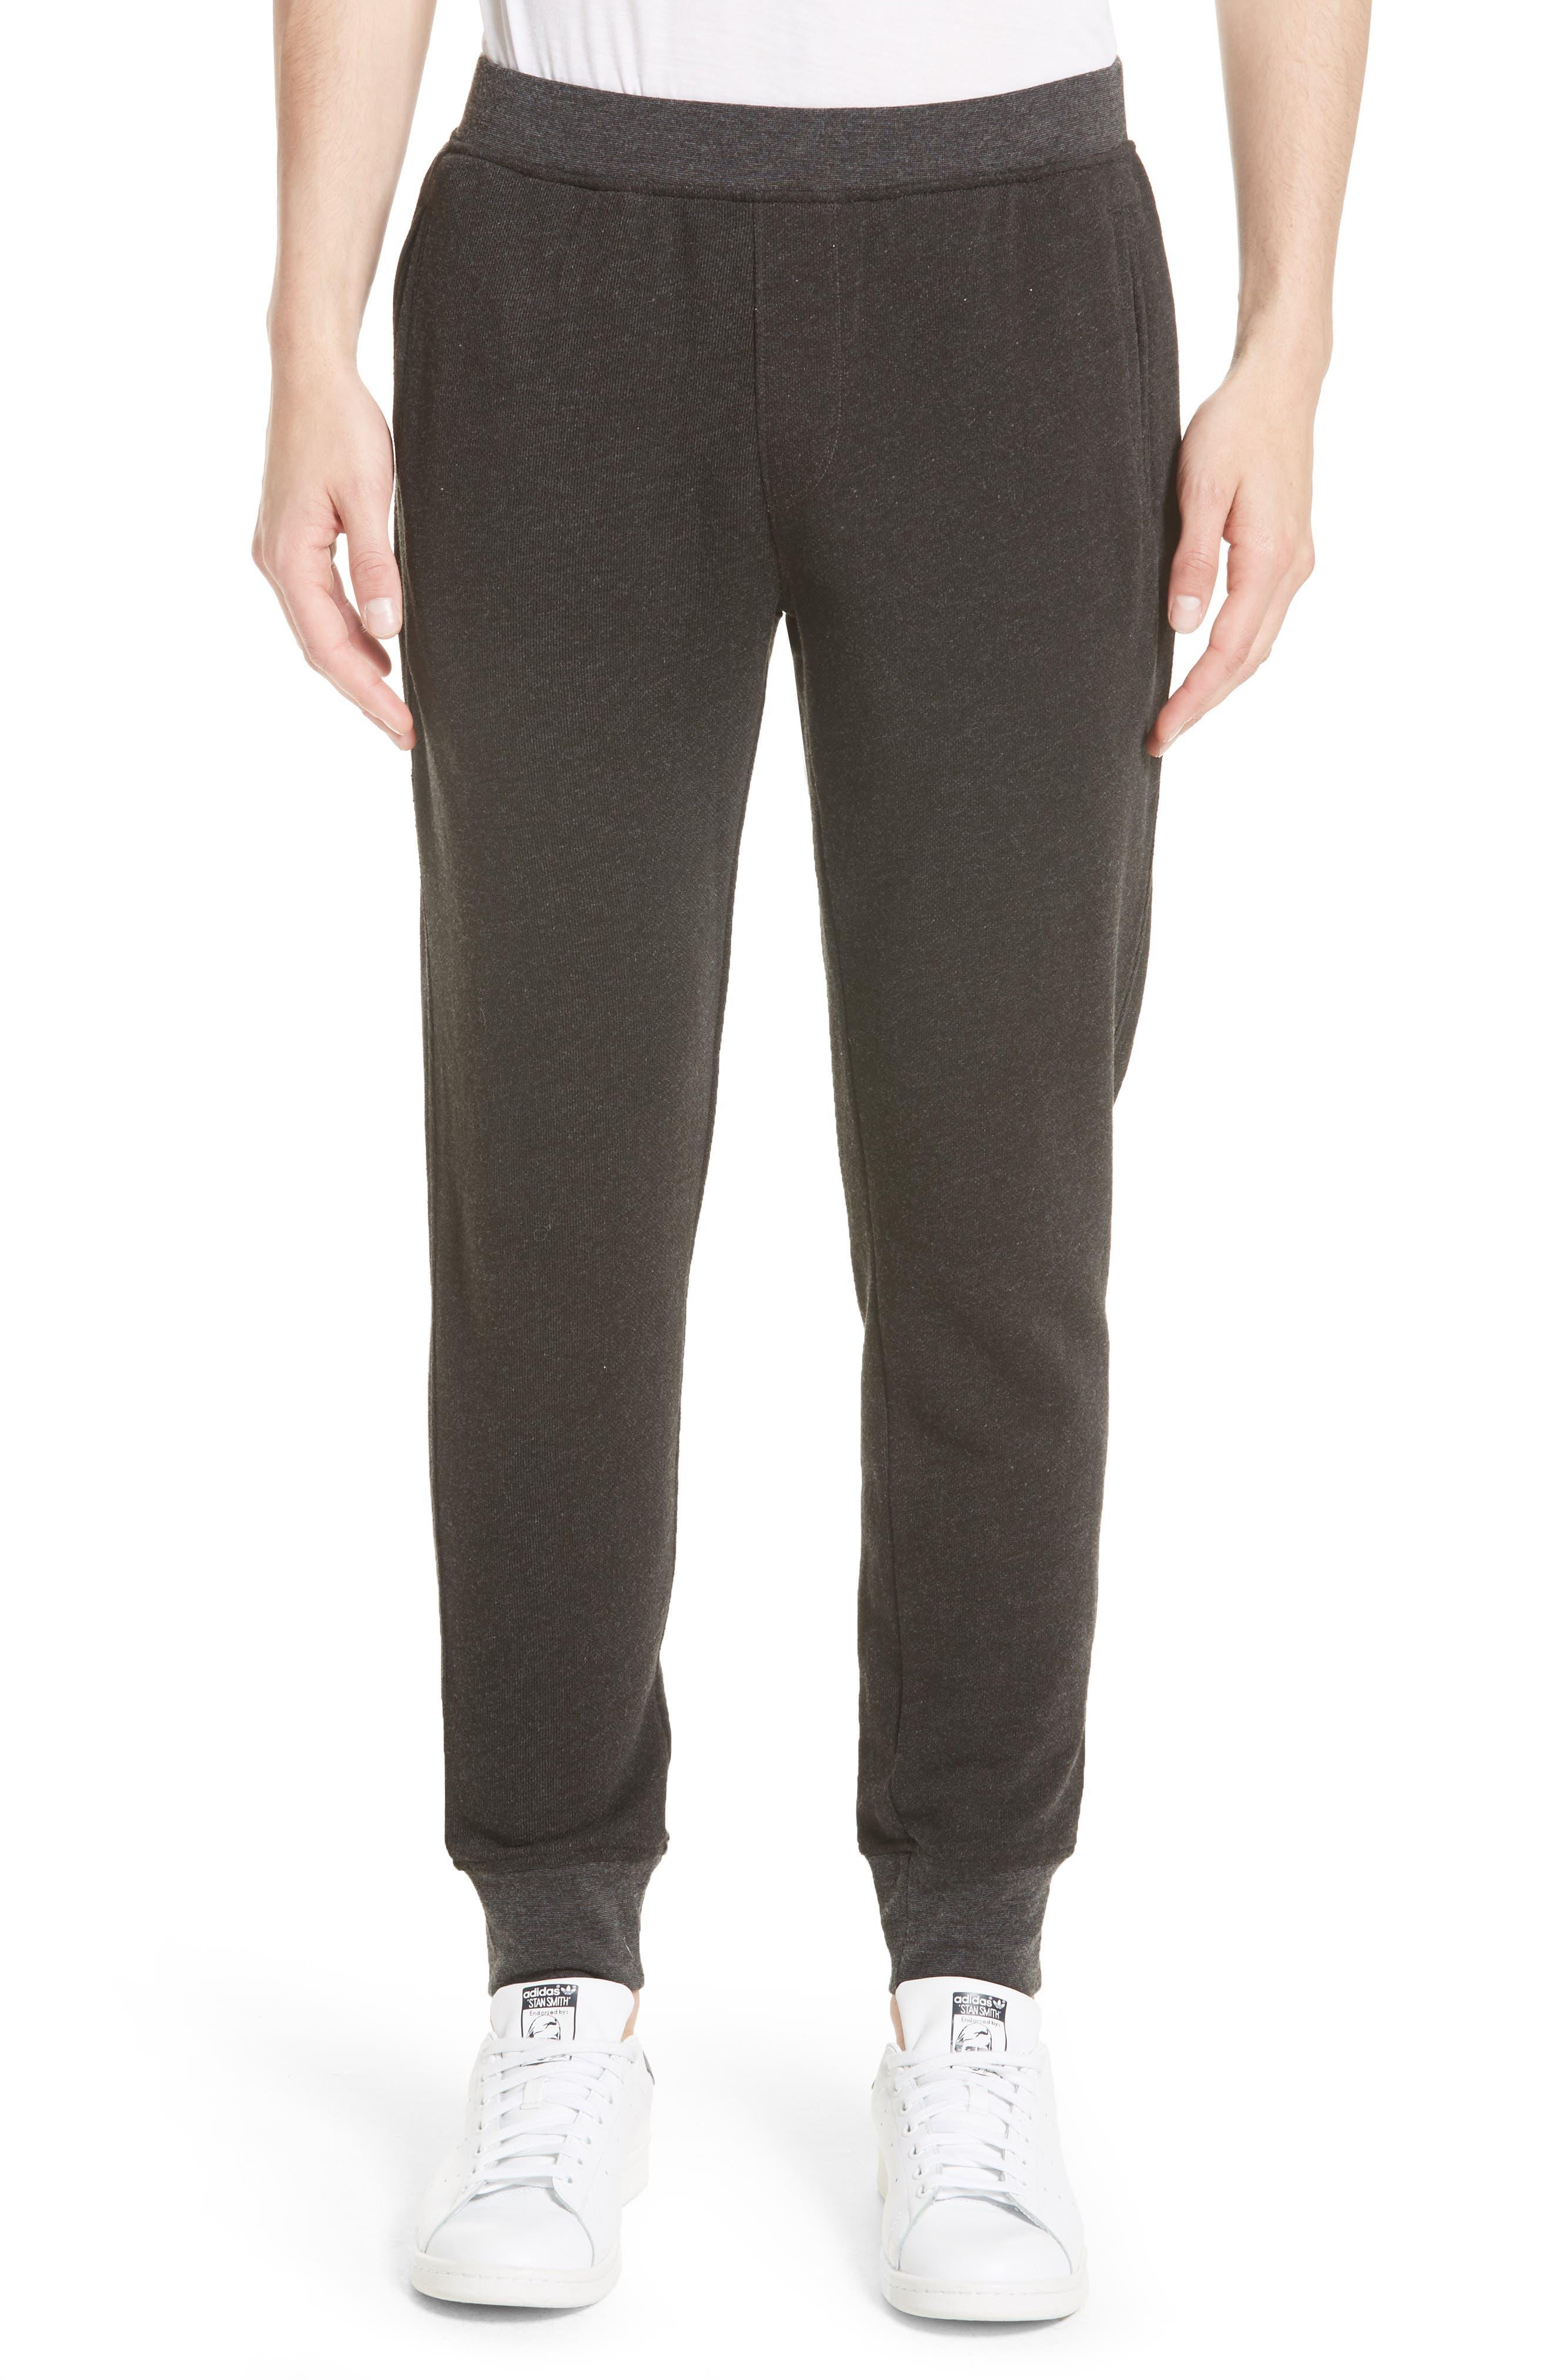 Jogger Pants,                         Main,                         color, Charcoal